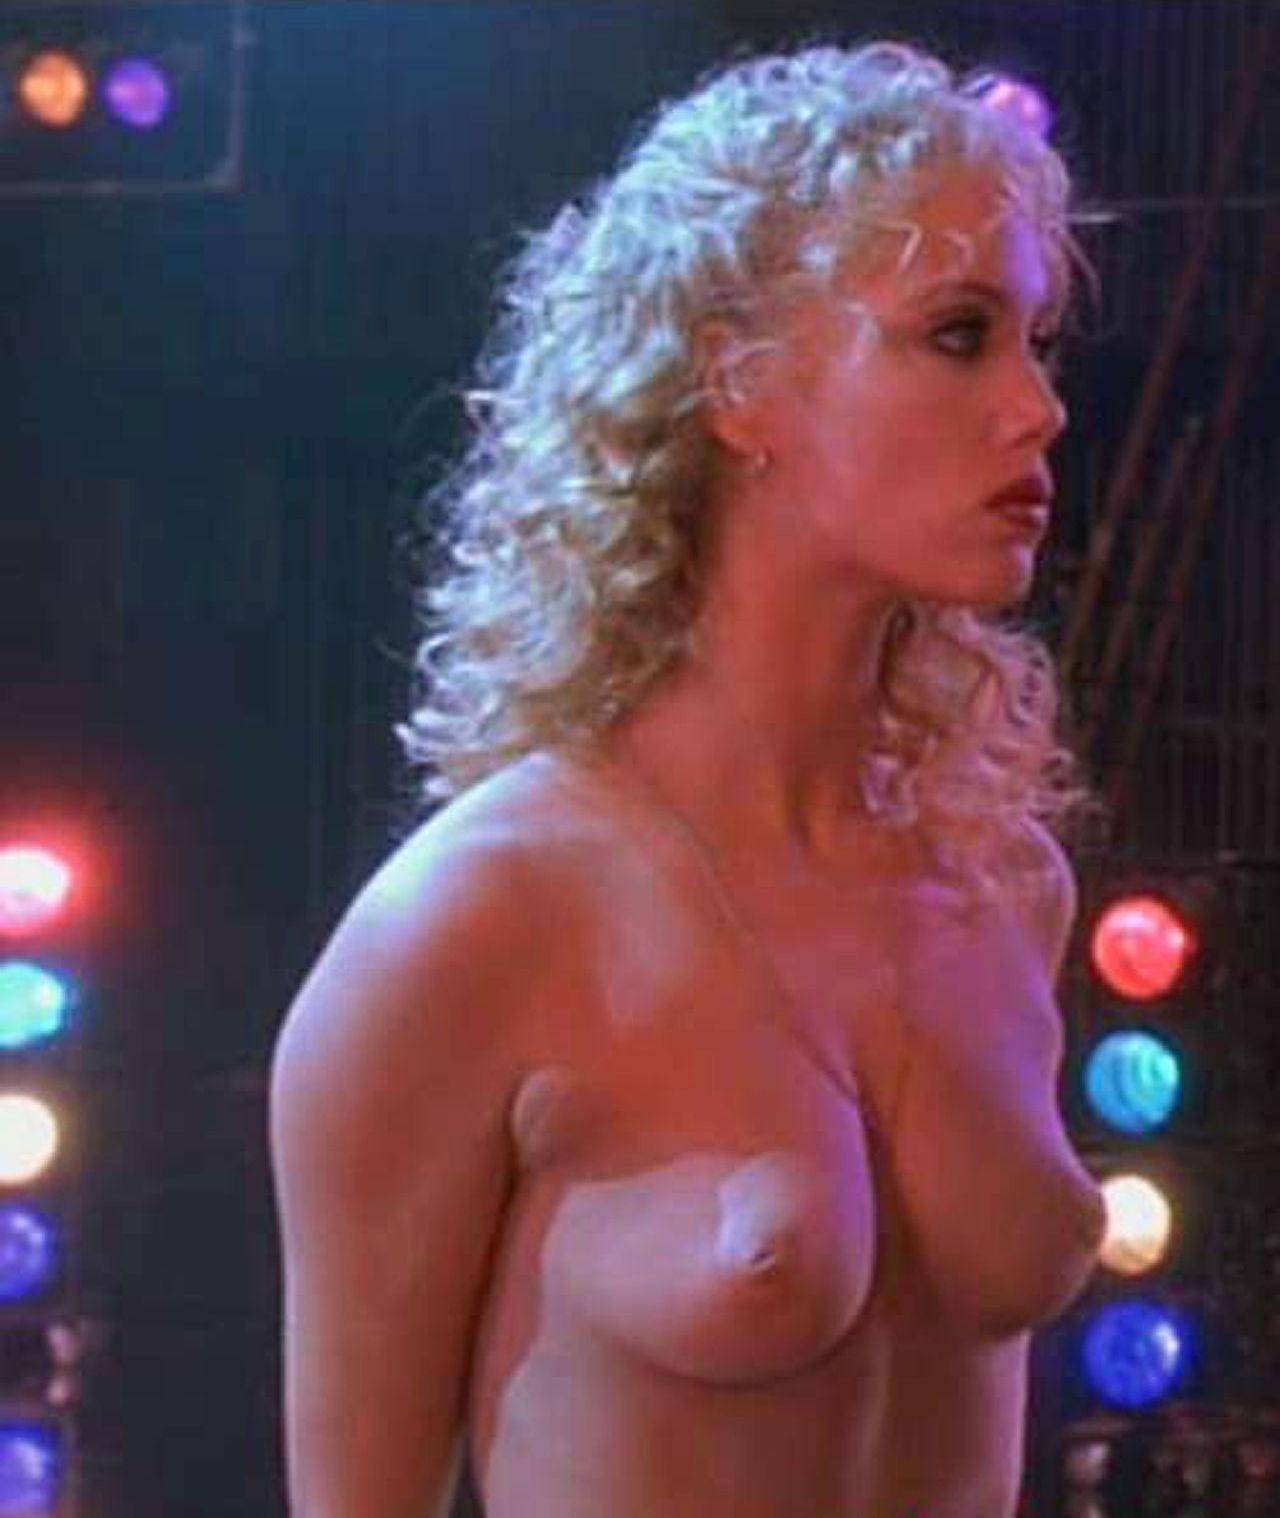 Elizabeth berkley naked pictures, dans porn site